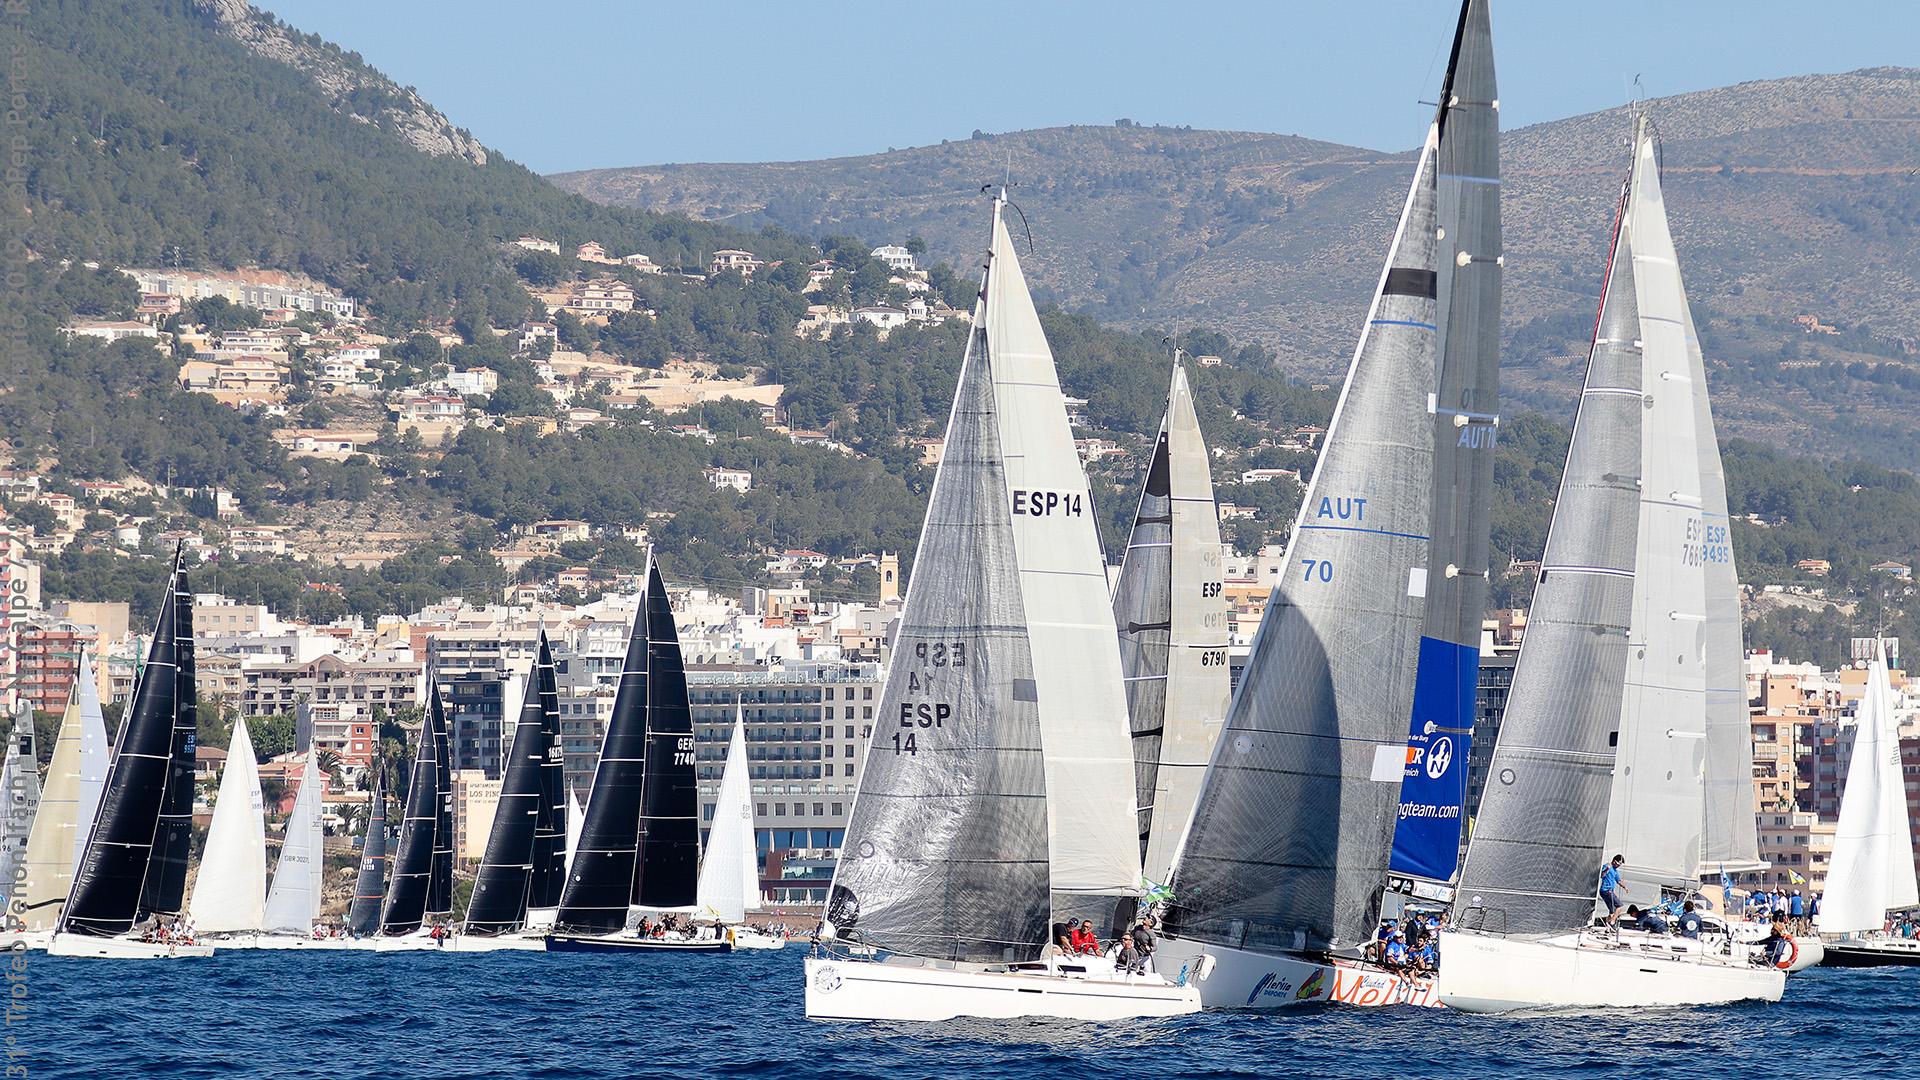 31º Trofeo Ifach